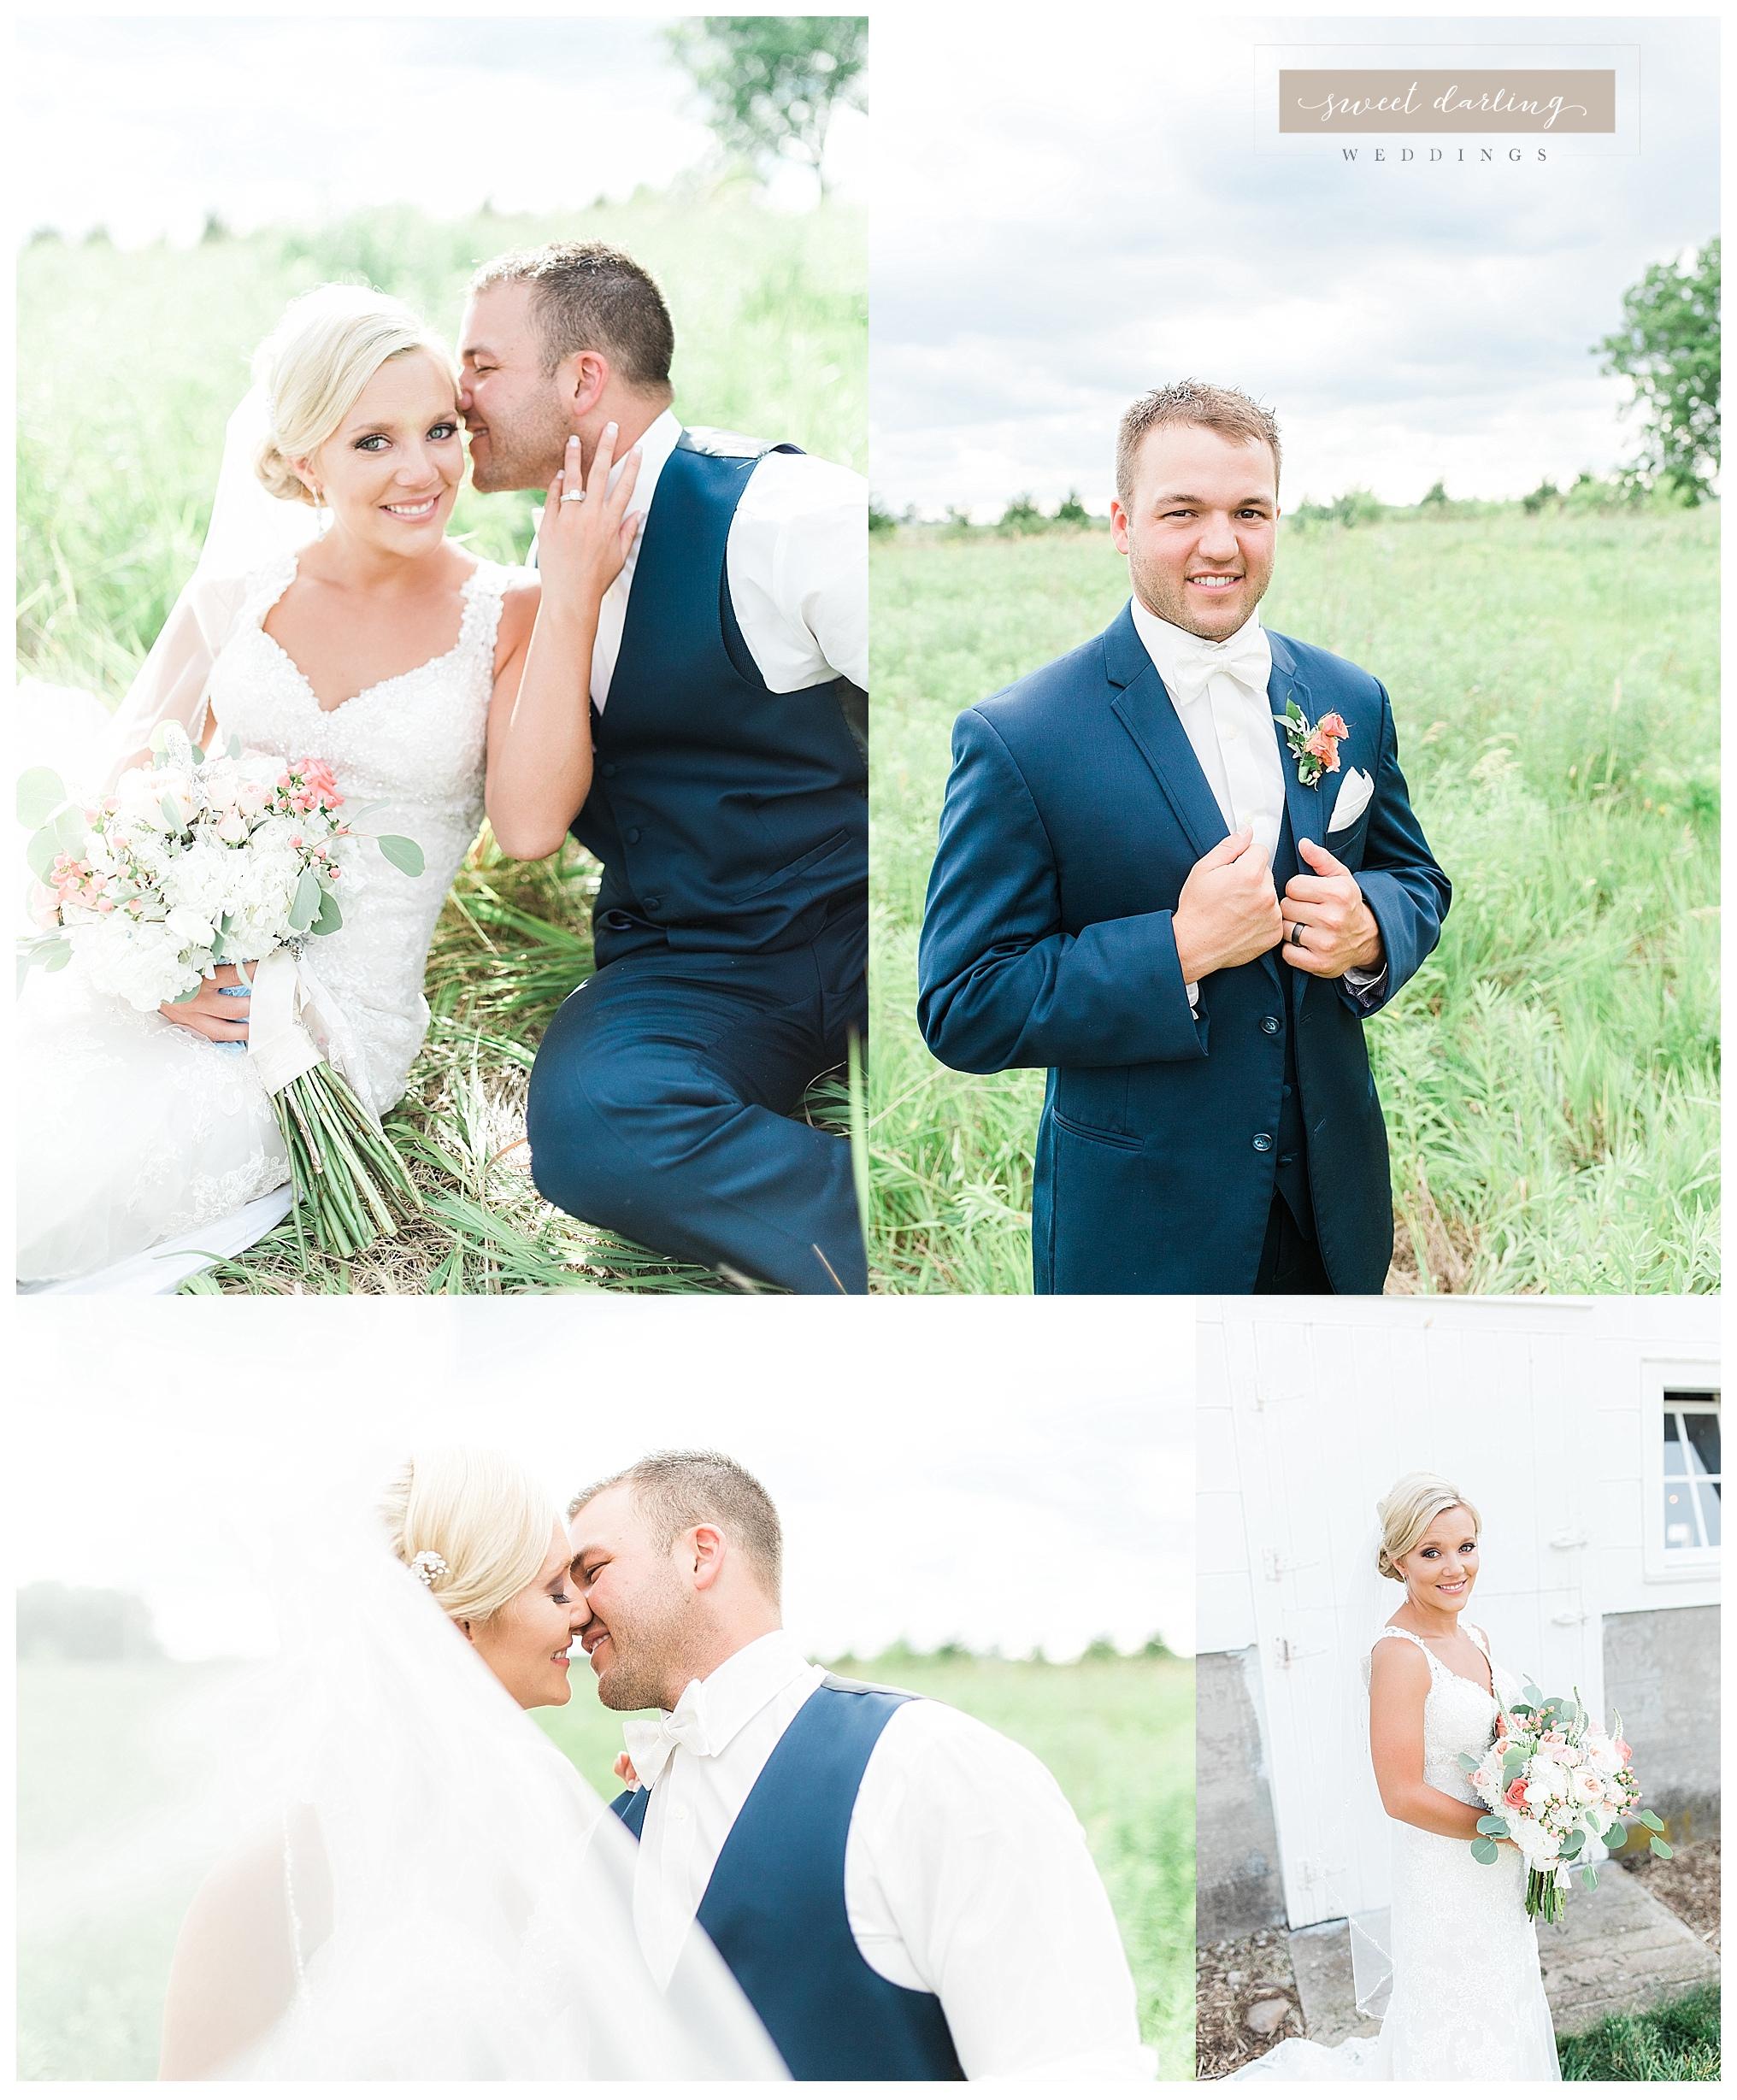 Paxton-illinois-engelbrecht-farmstead-romantic-wedding-photographer-sweet-darling-weddings_1226.jpg